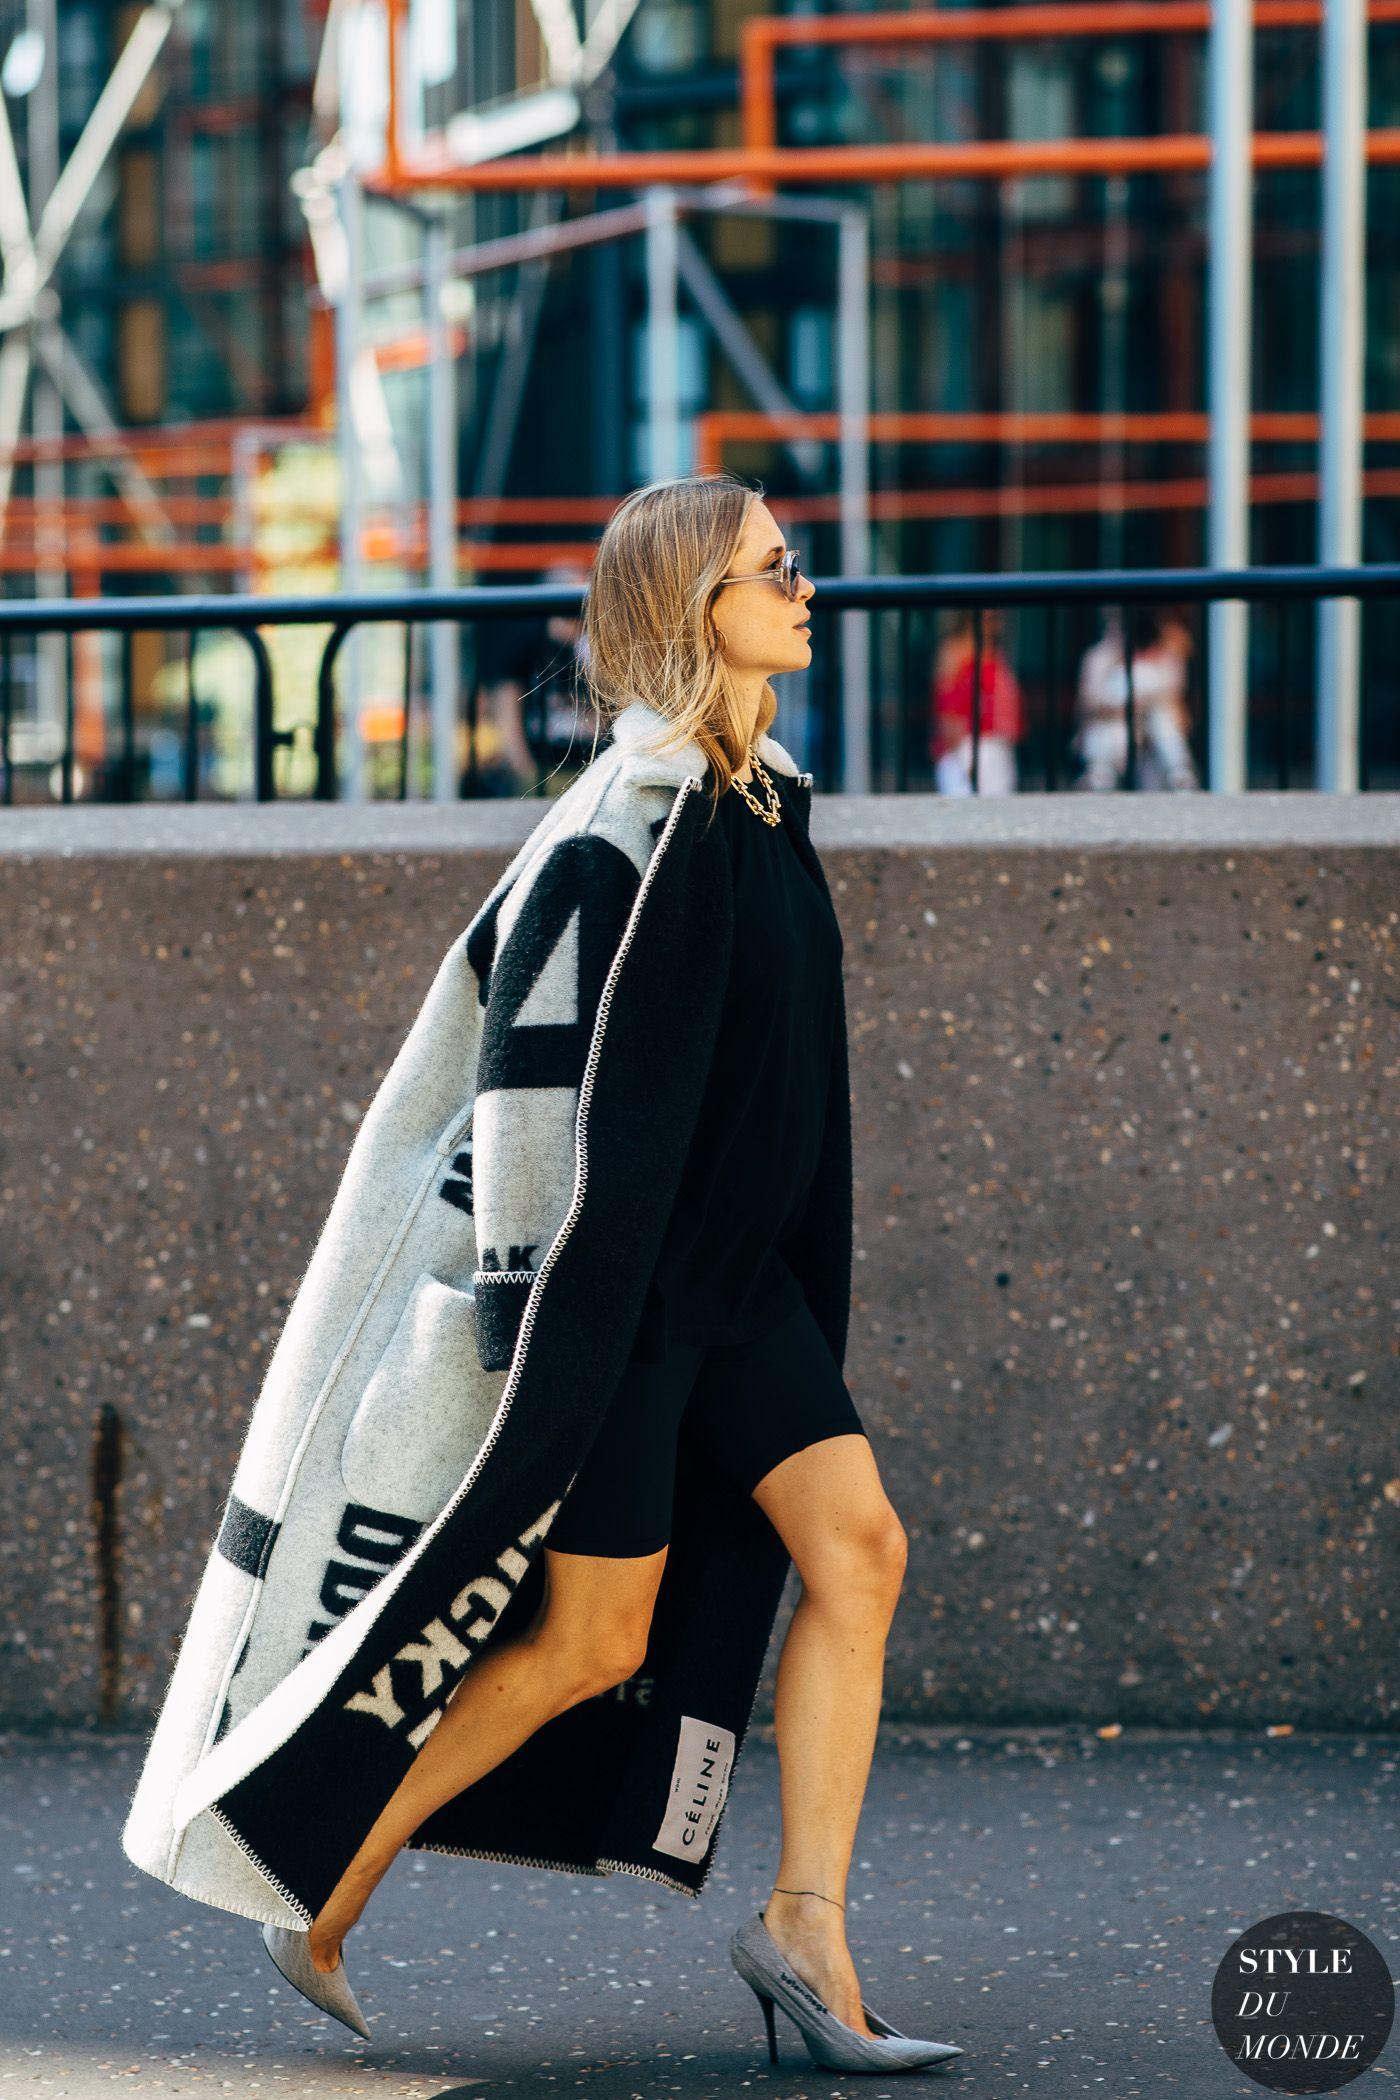 4dd0bb64a232 Pernille Teisbaek by STYLEDUMONDE Street Style Fashion  Photography20180917 48A0280